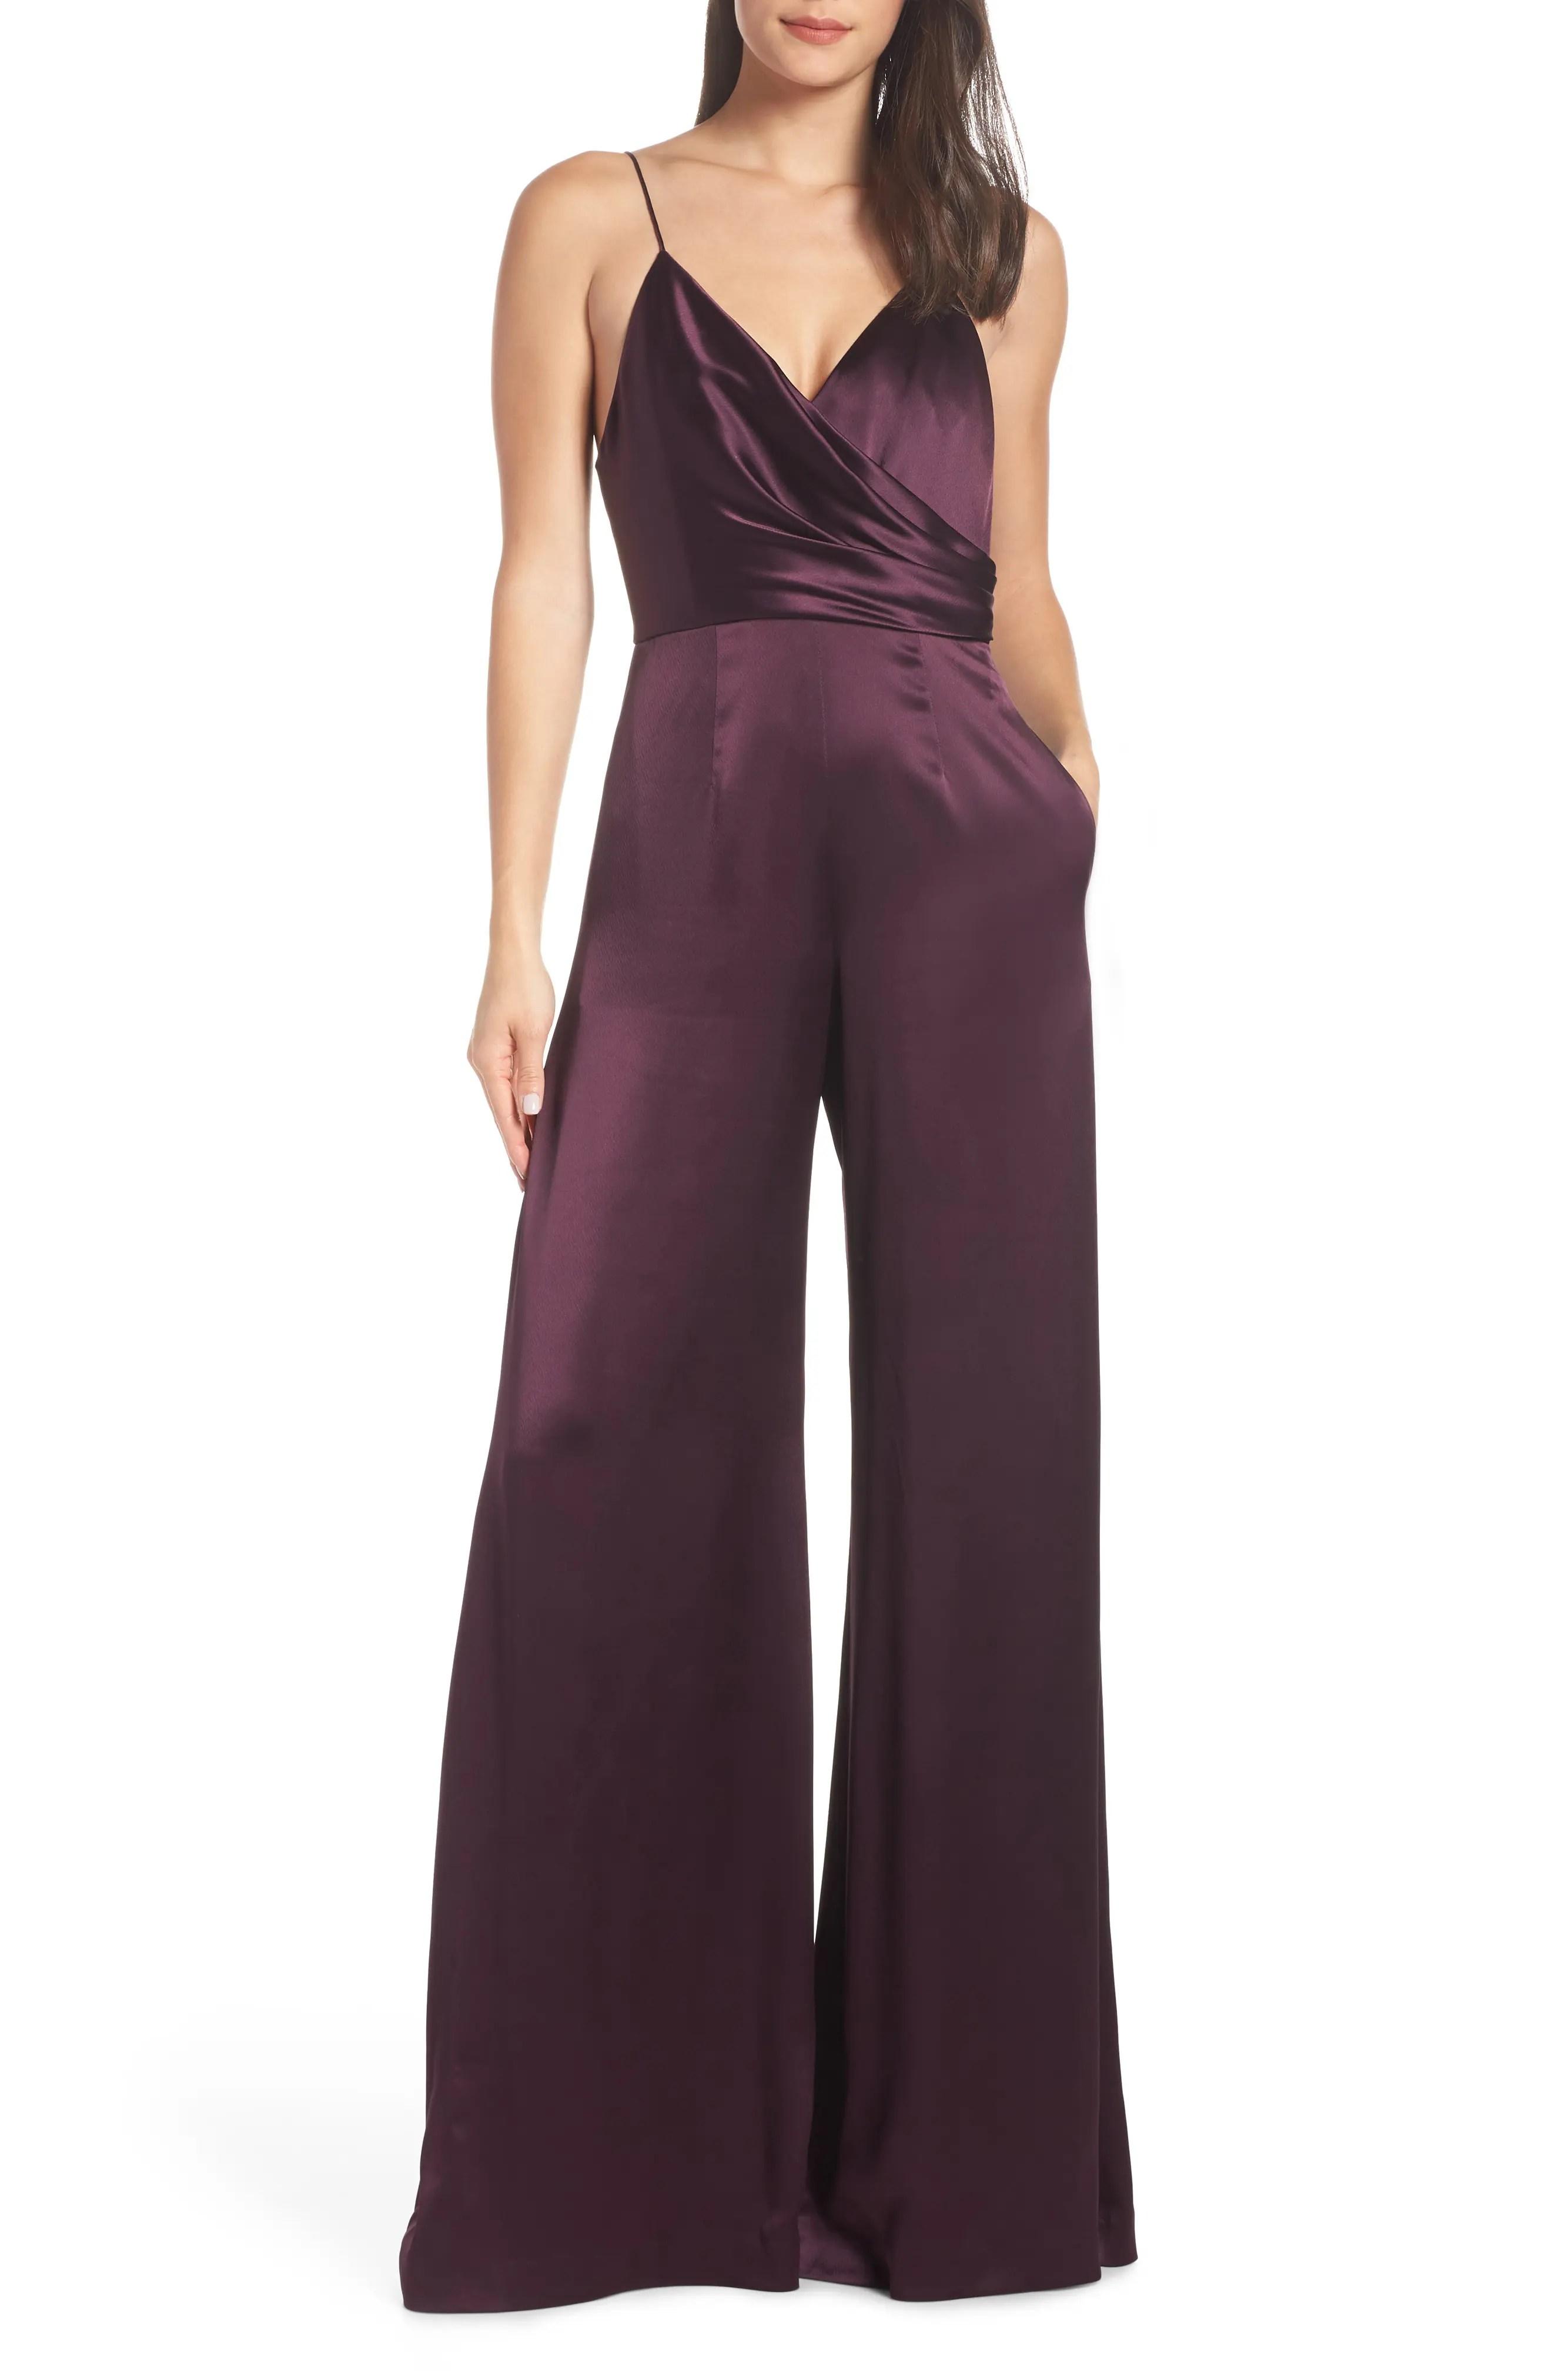 Jill stuart wrap look satin jumpsuit also dresses  gowns nordstrom rh shoprdstrom